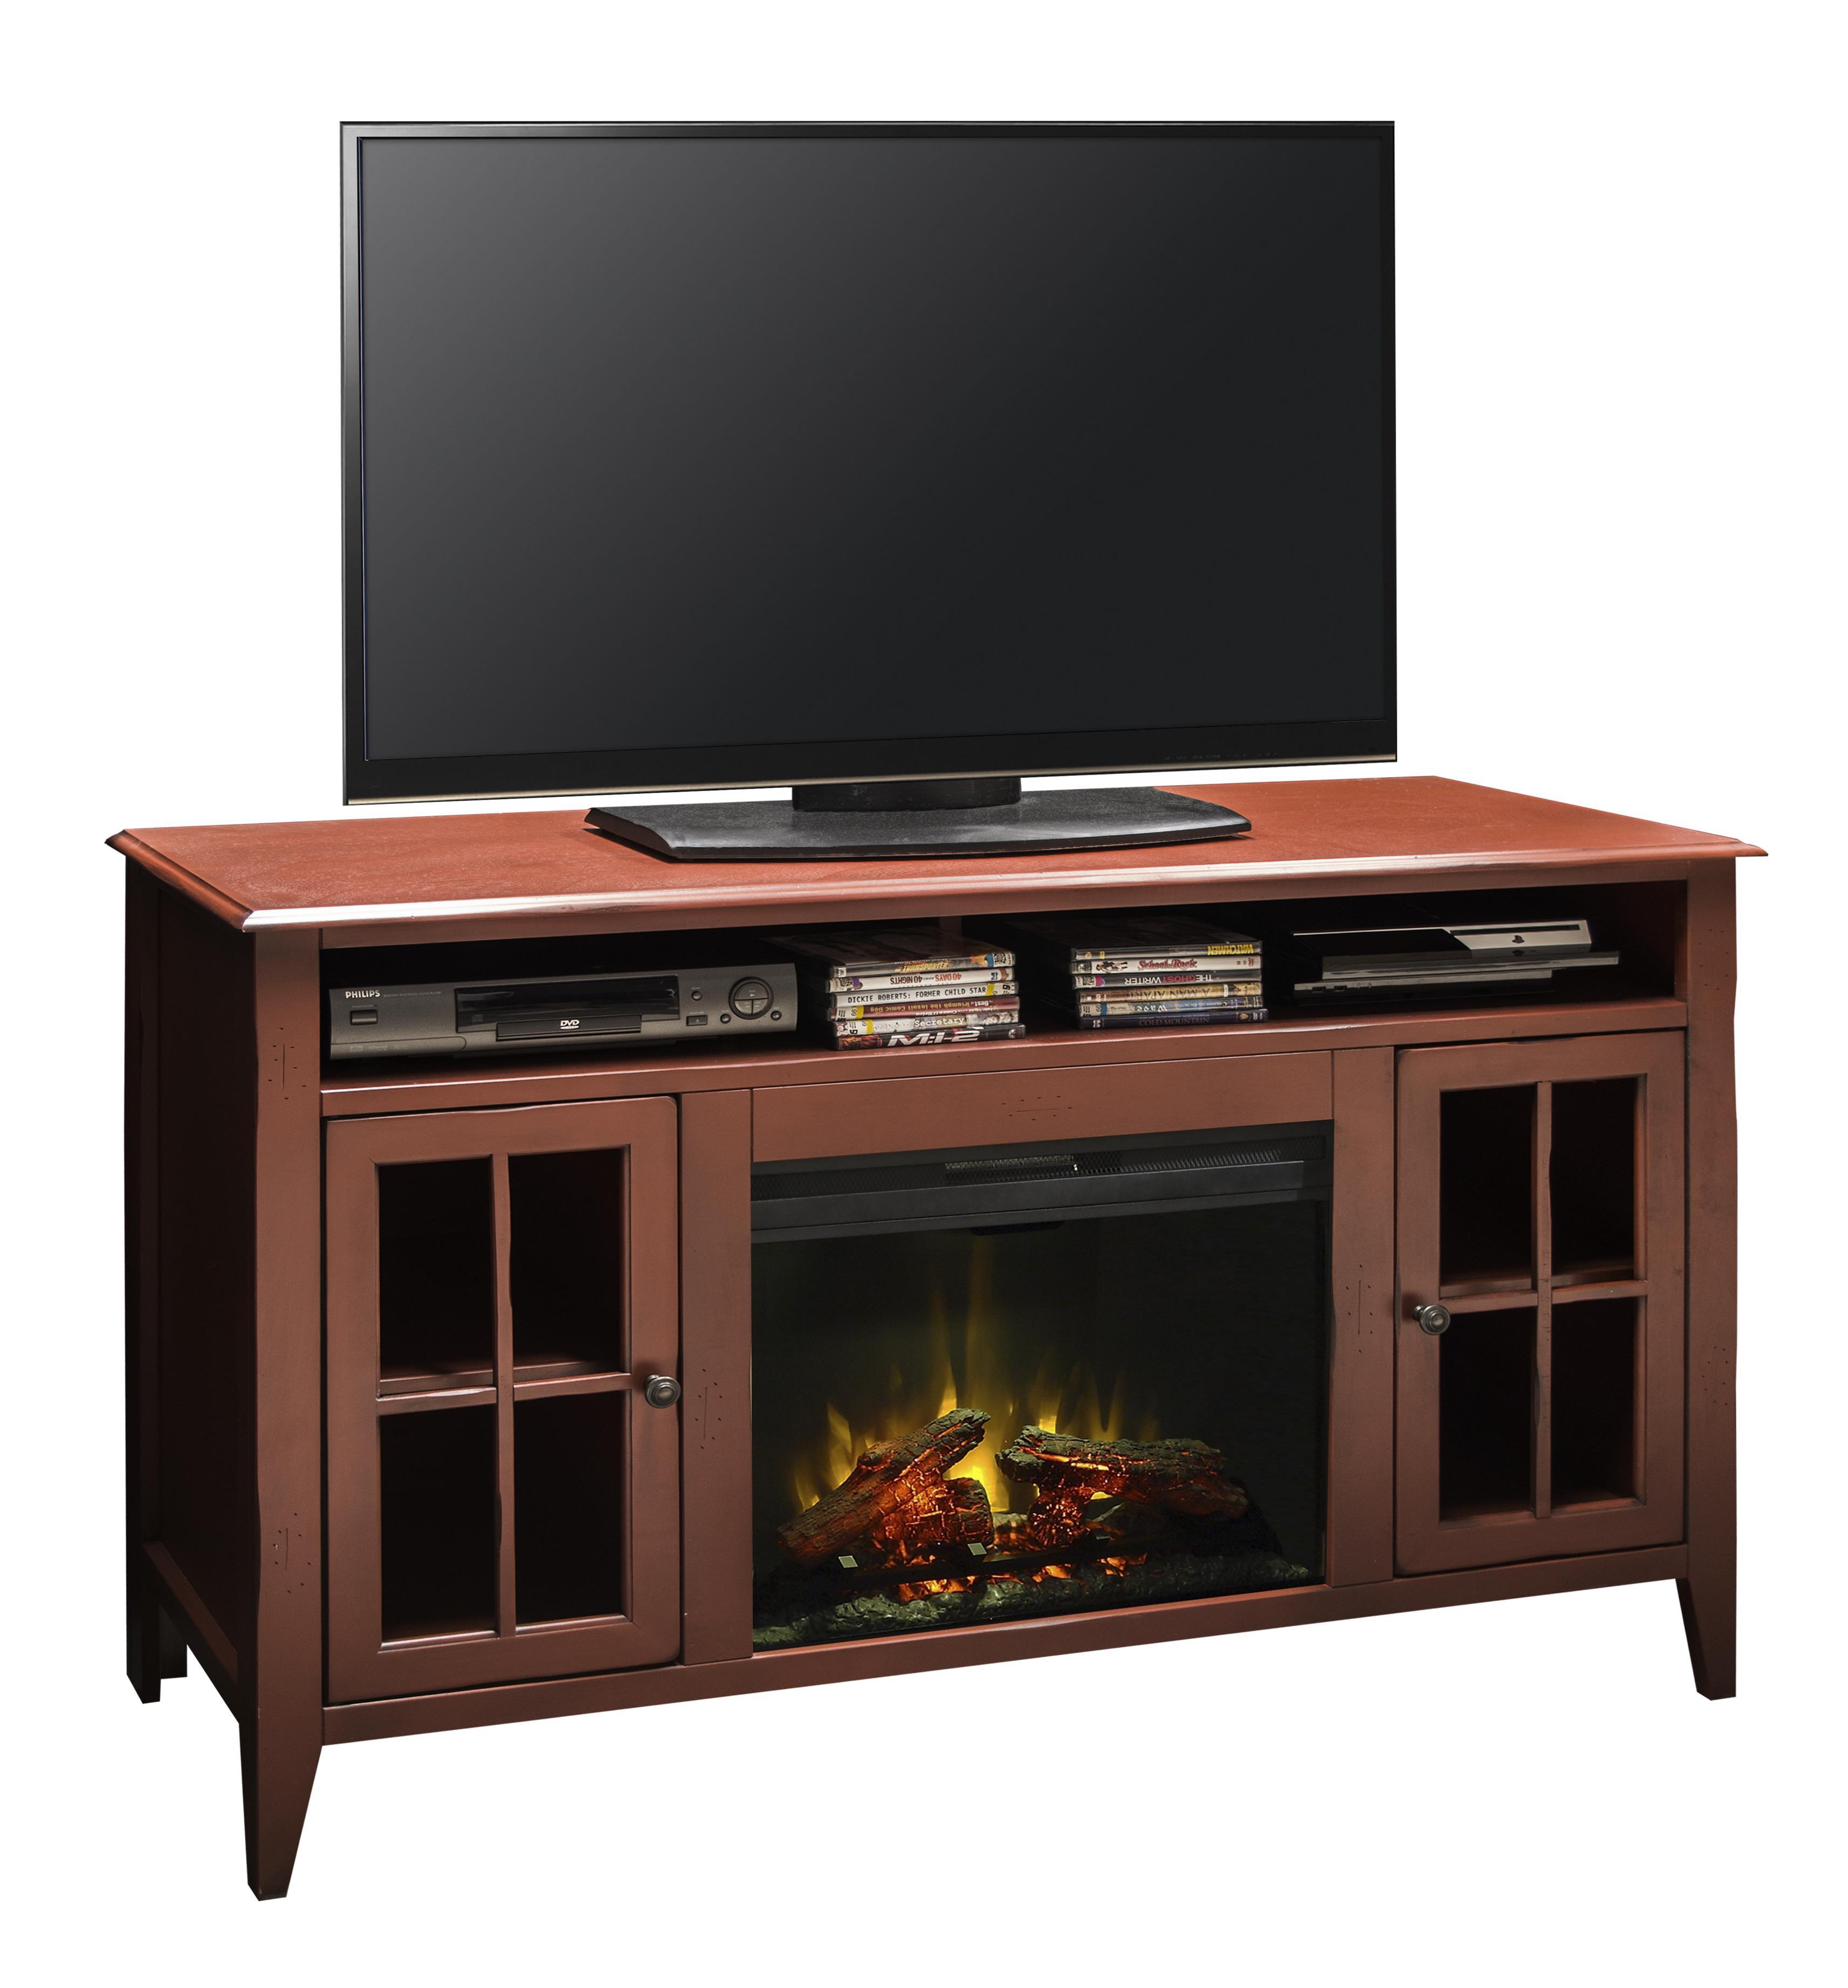 "Legends Furniture Calistoga Collection Calistoga 60"" TV Console - Item Number: CA5313-KIT"